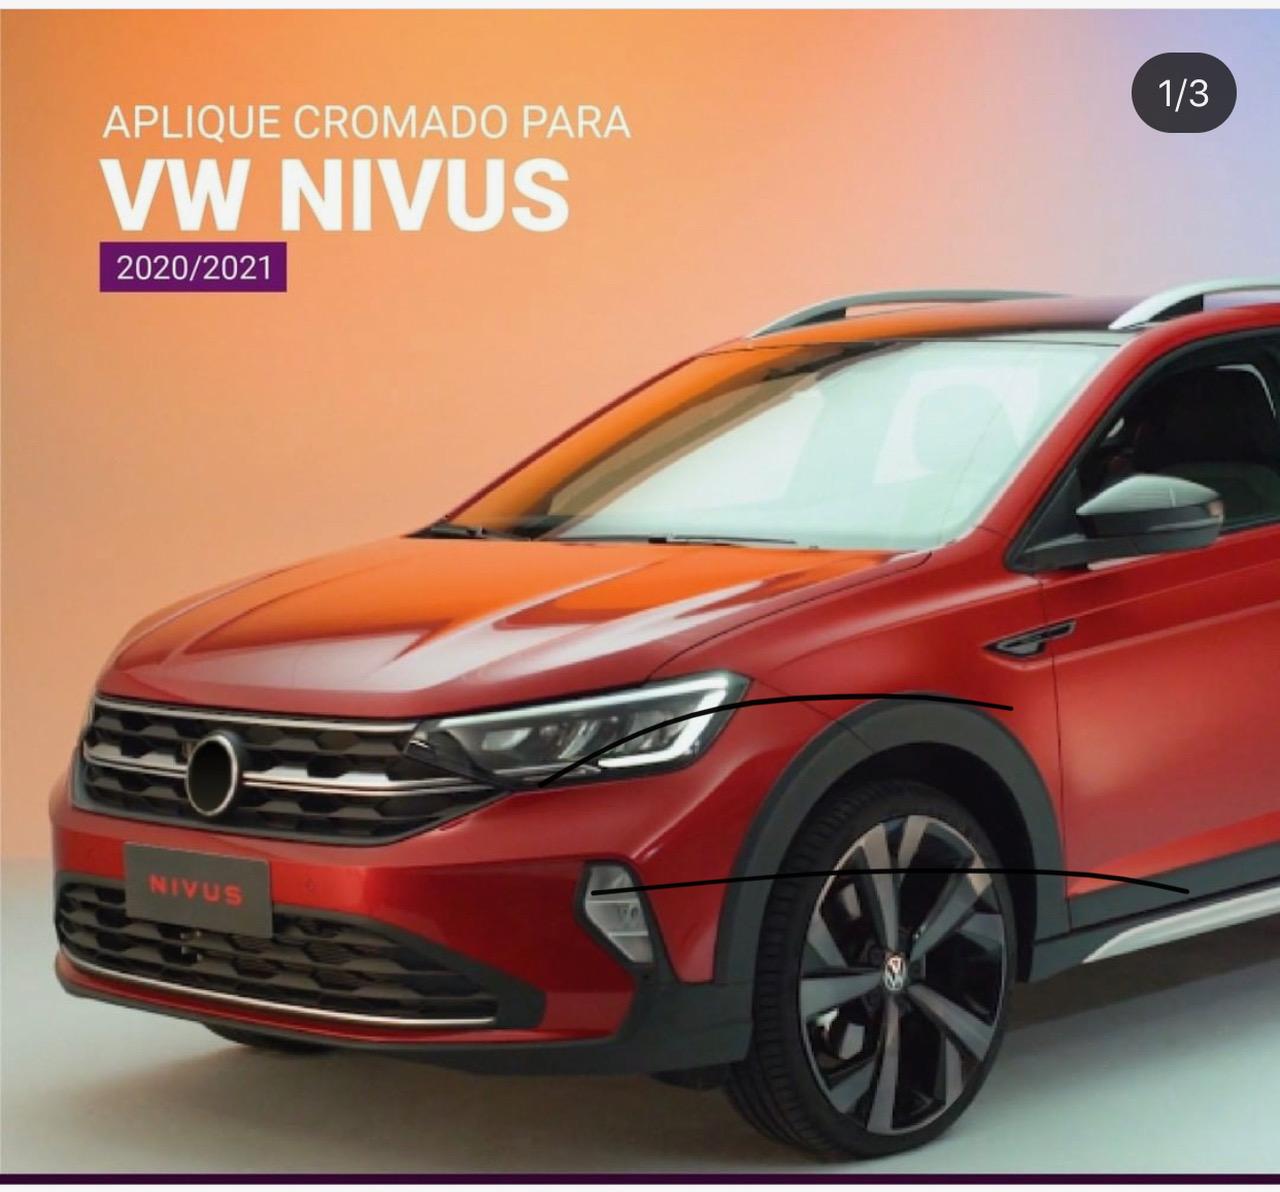 Shekparts lança apliques cromados para VW Nivus